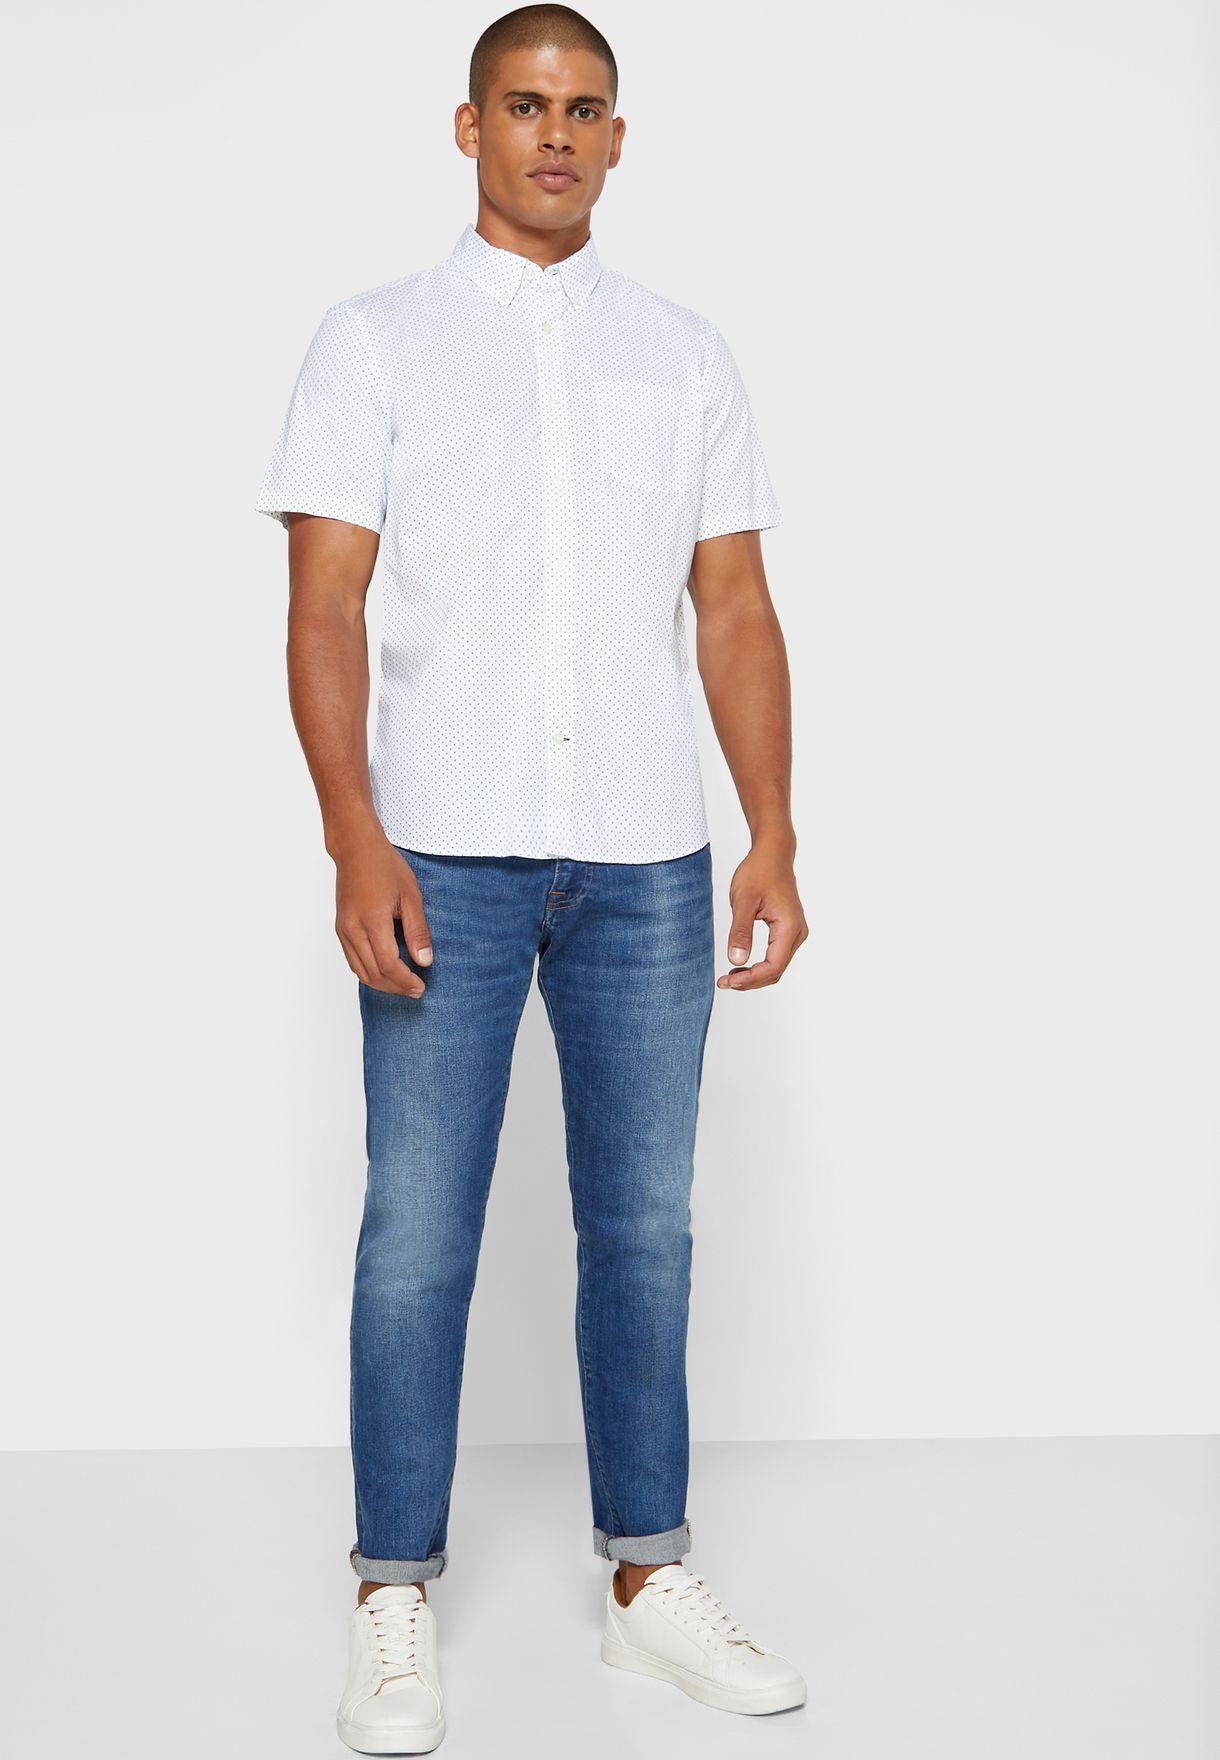 قميص بطبعة نقاط